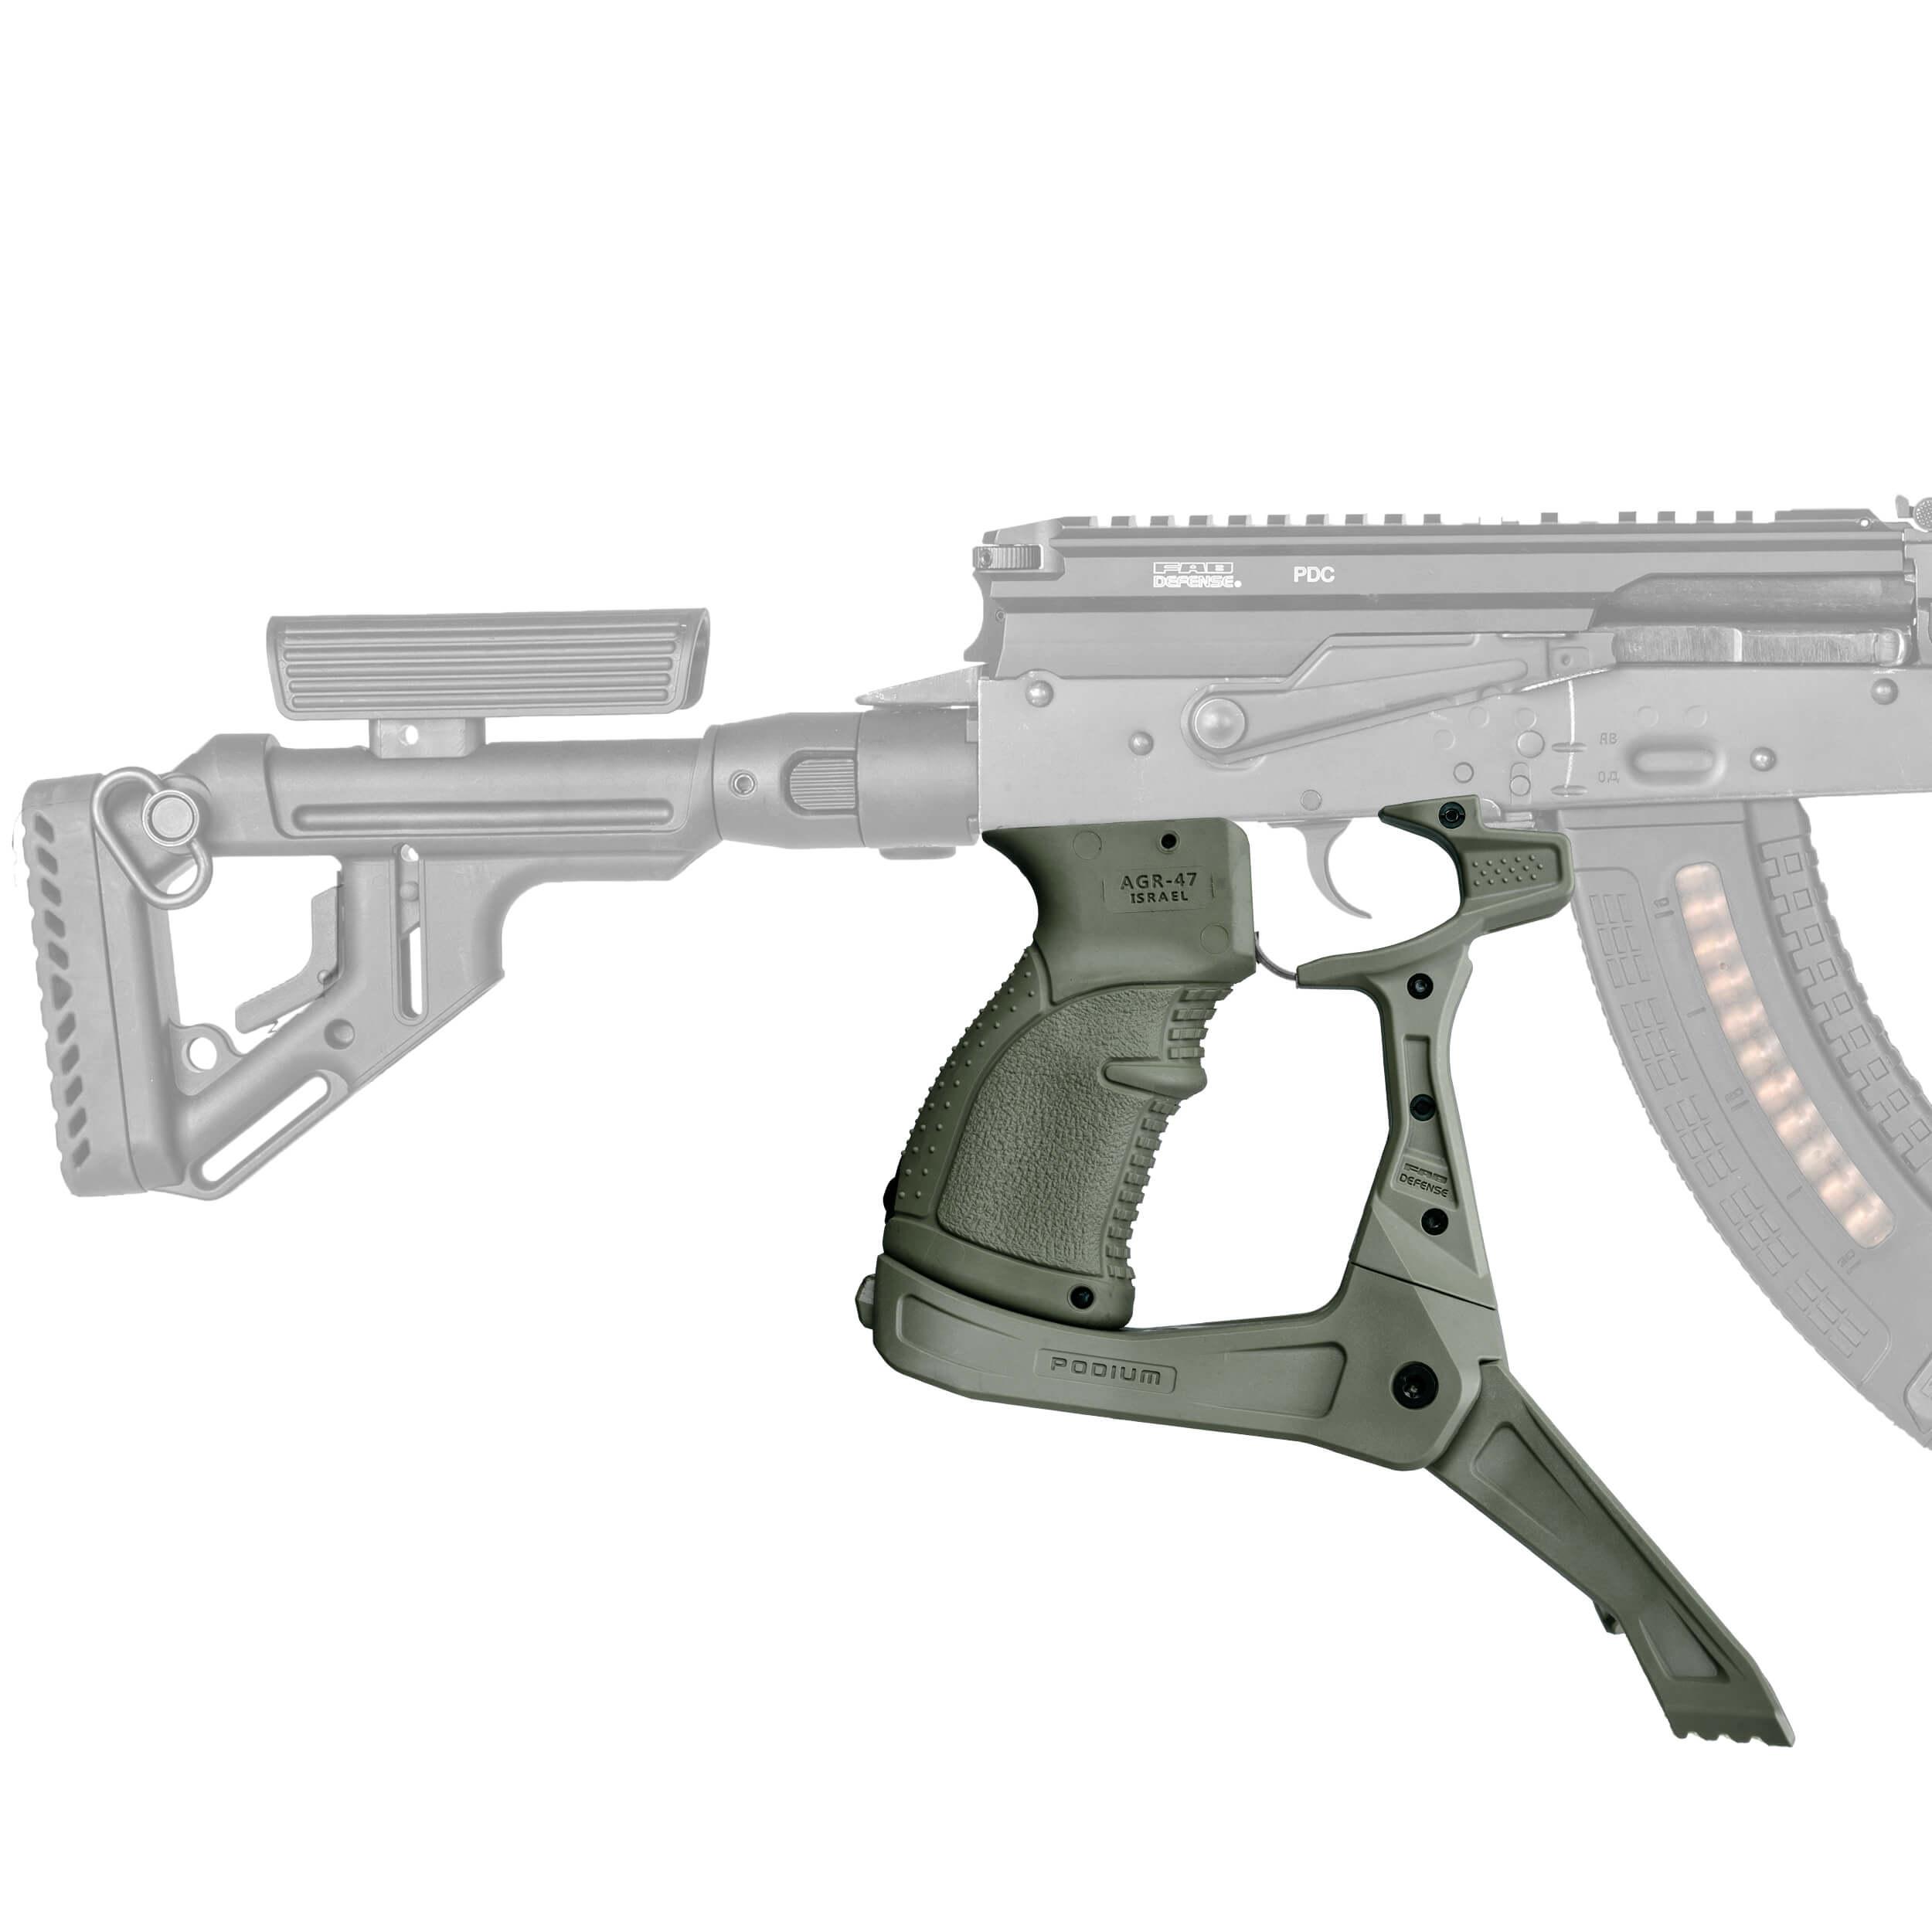 AK-Podium Pistolgrip Bipod for AK-47